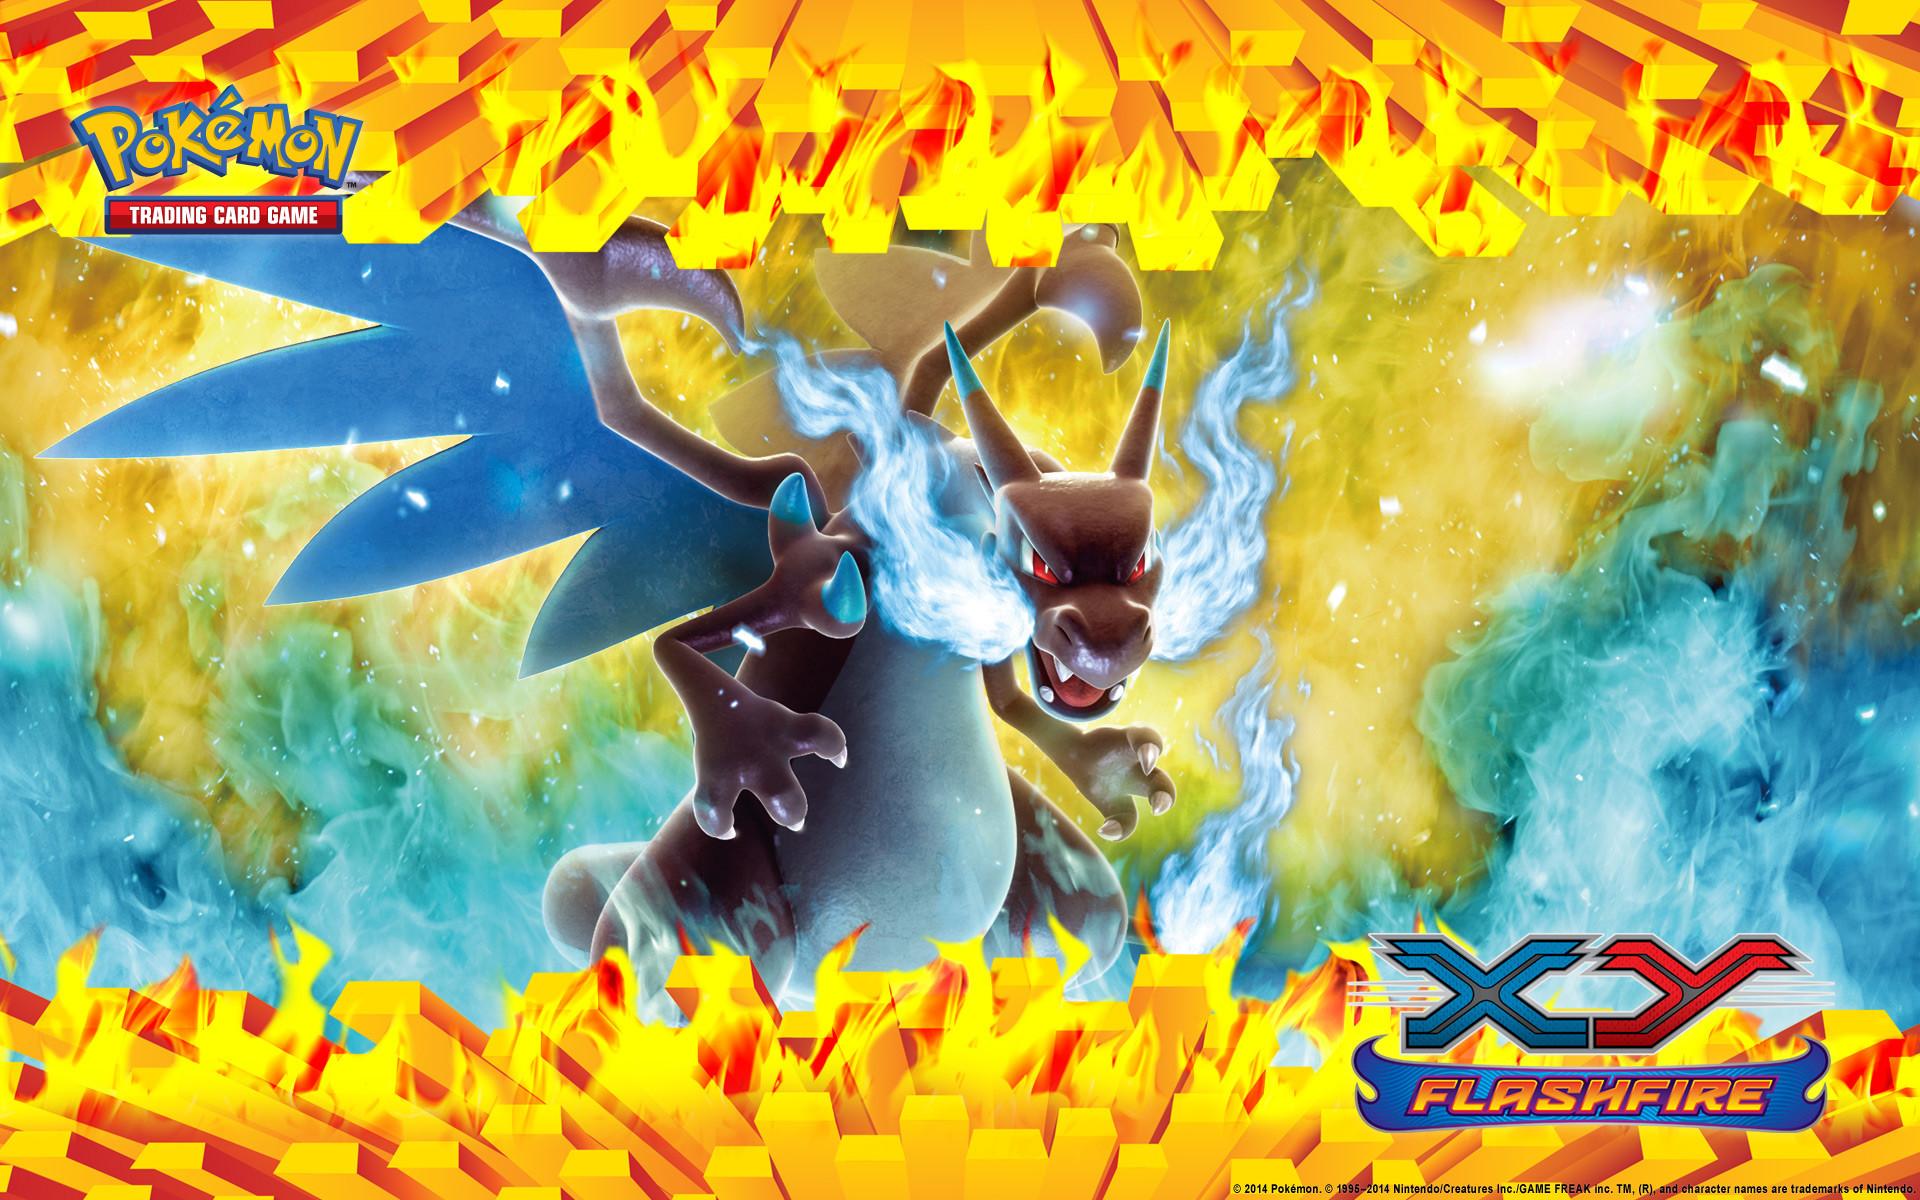 xy02-wallpaper-mega-charizard-1920.jpg 1,920×1,200 pixels   pokemon    Pinterest   Pokémon